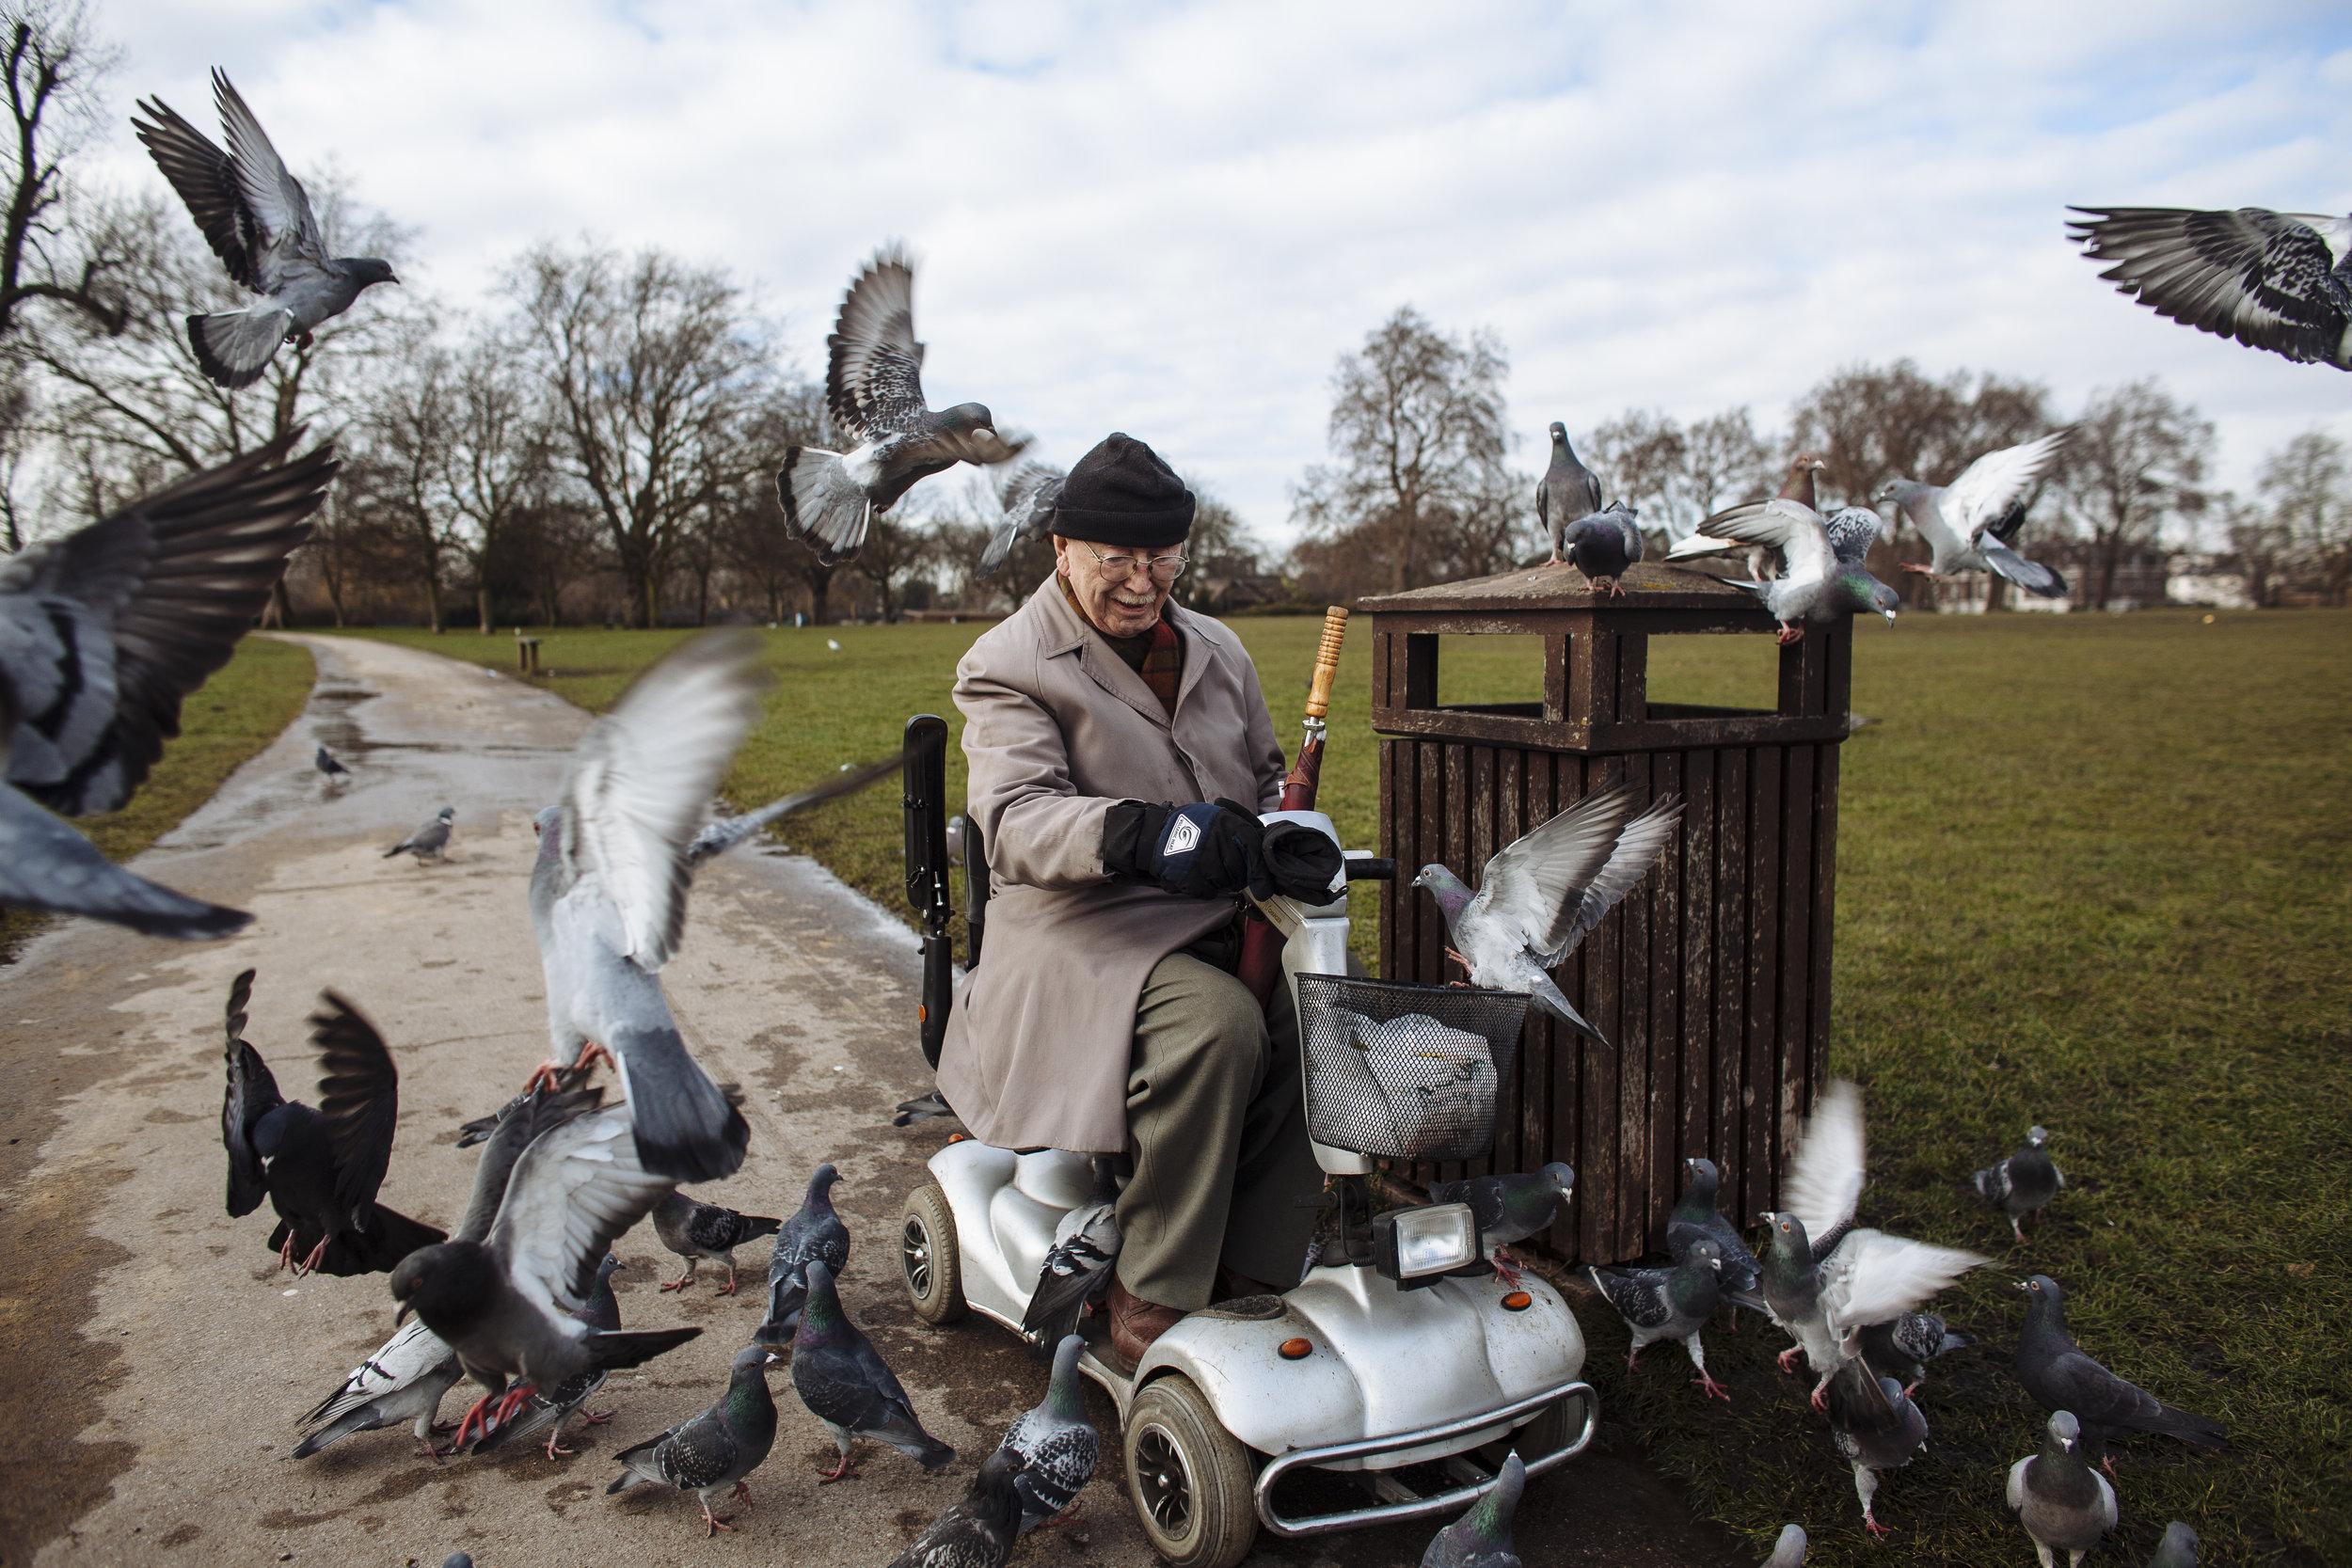 An elderly man feeds birds in Regents Park, London, Wednesday, Feb. 11, 2009. (AP Photo/David Azia)